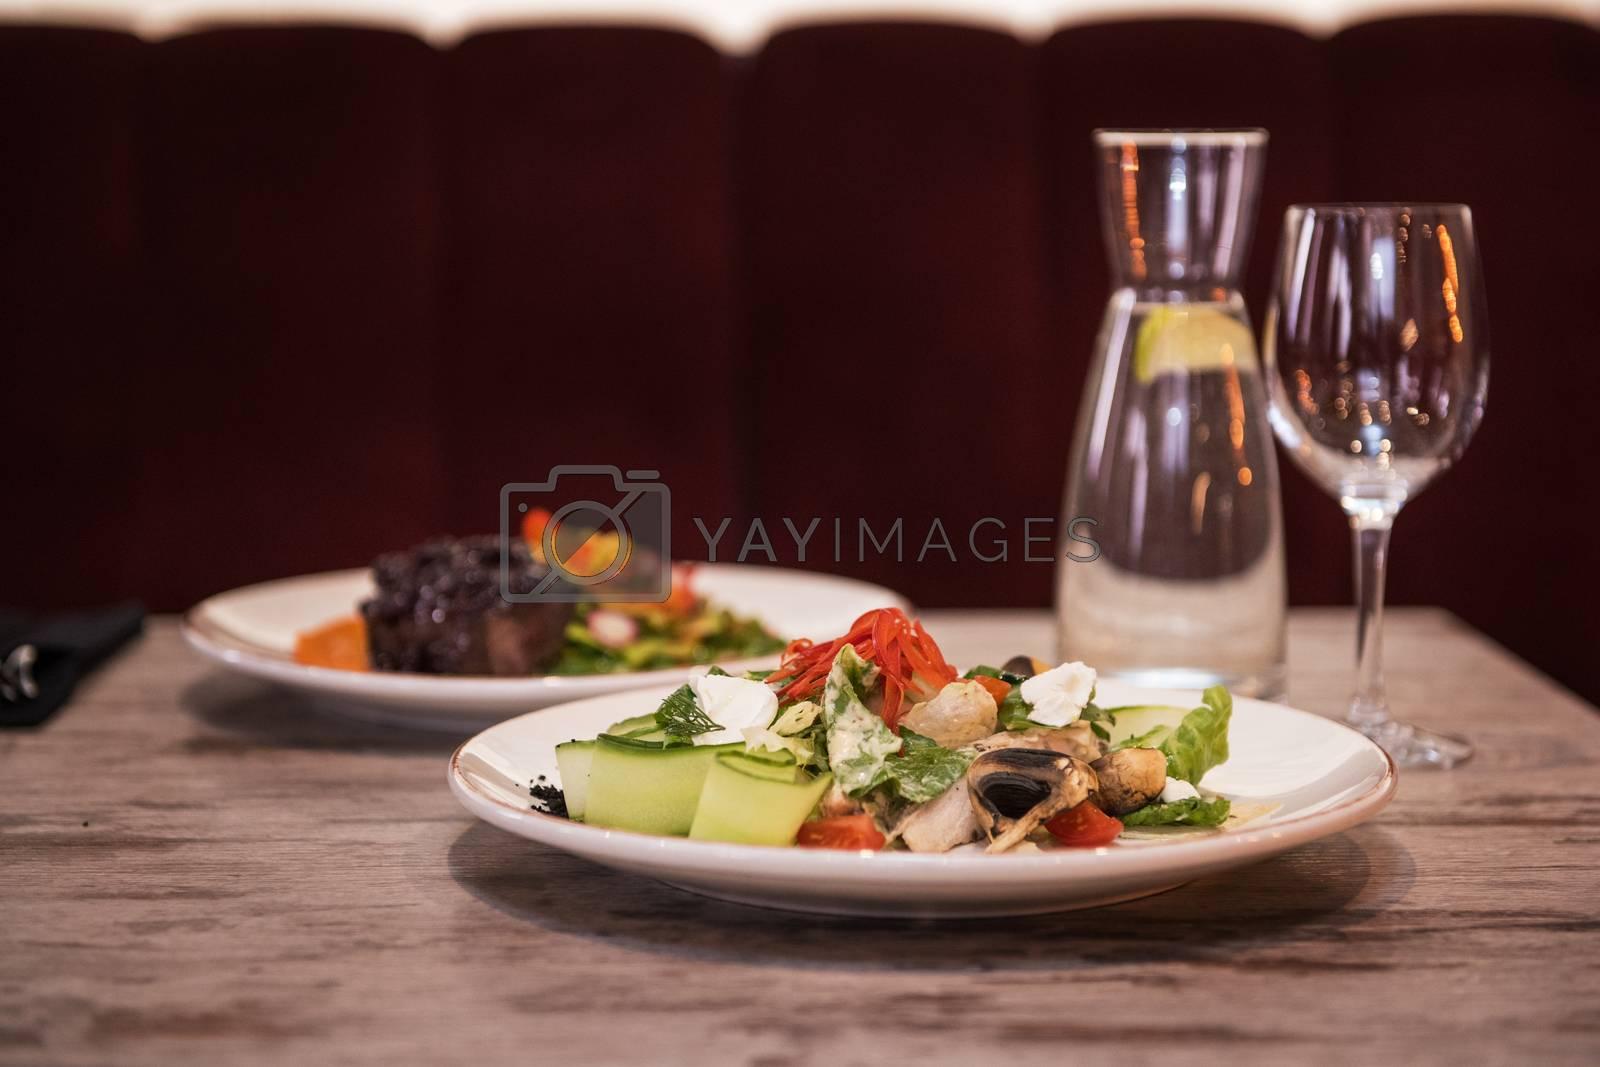 Mushroom garden vegetable salad on the restaurant table